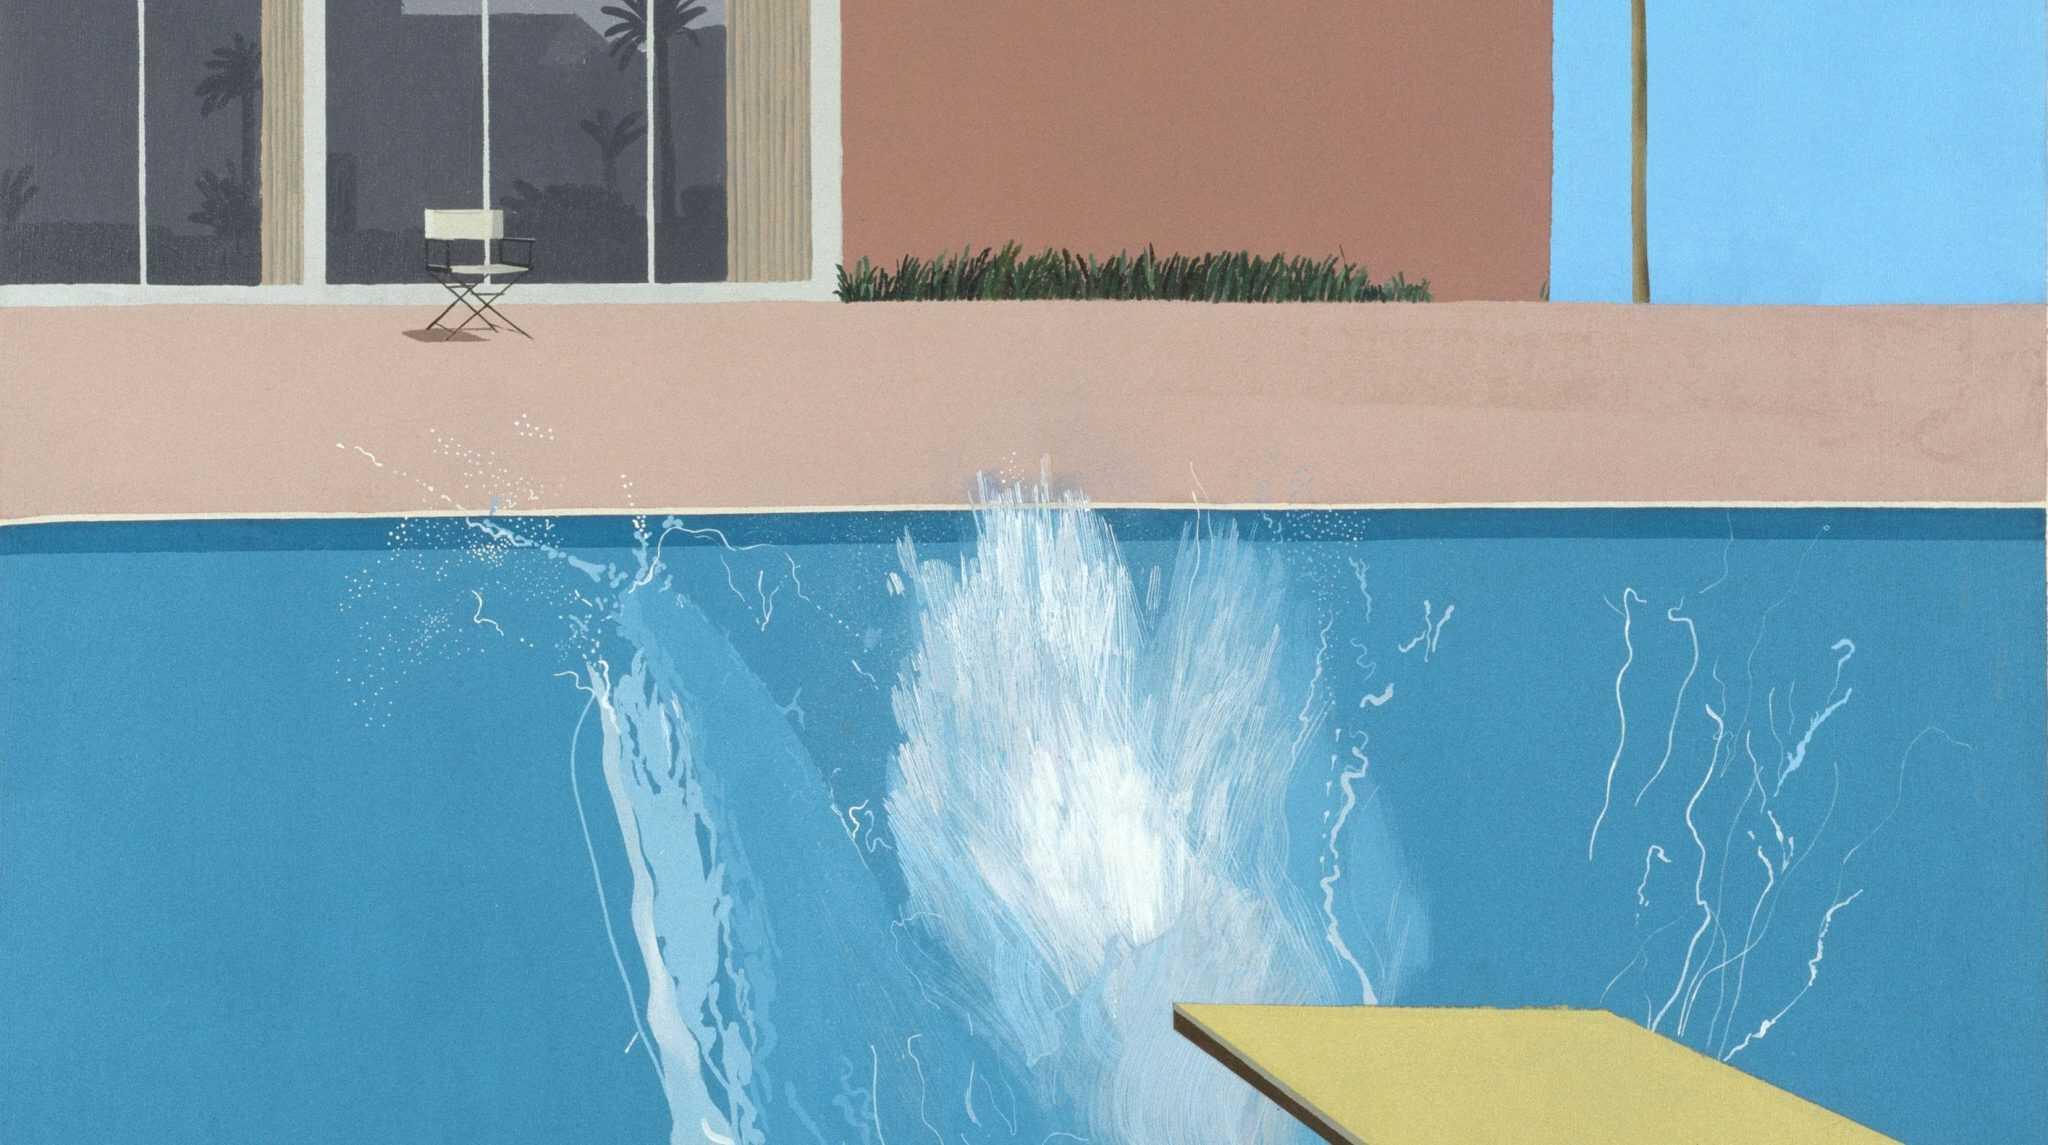 David Hockney Bigger splash auctionlab enchères